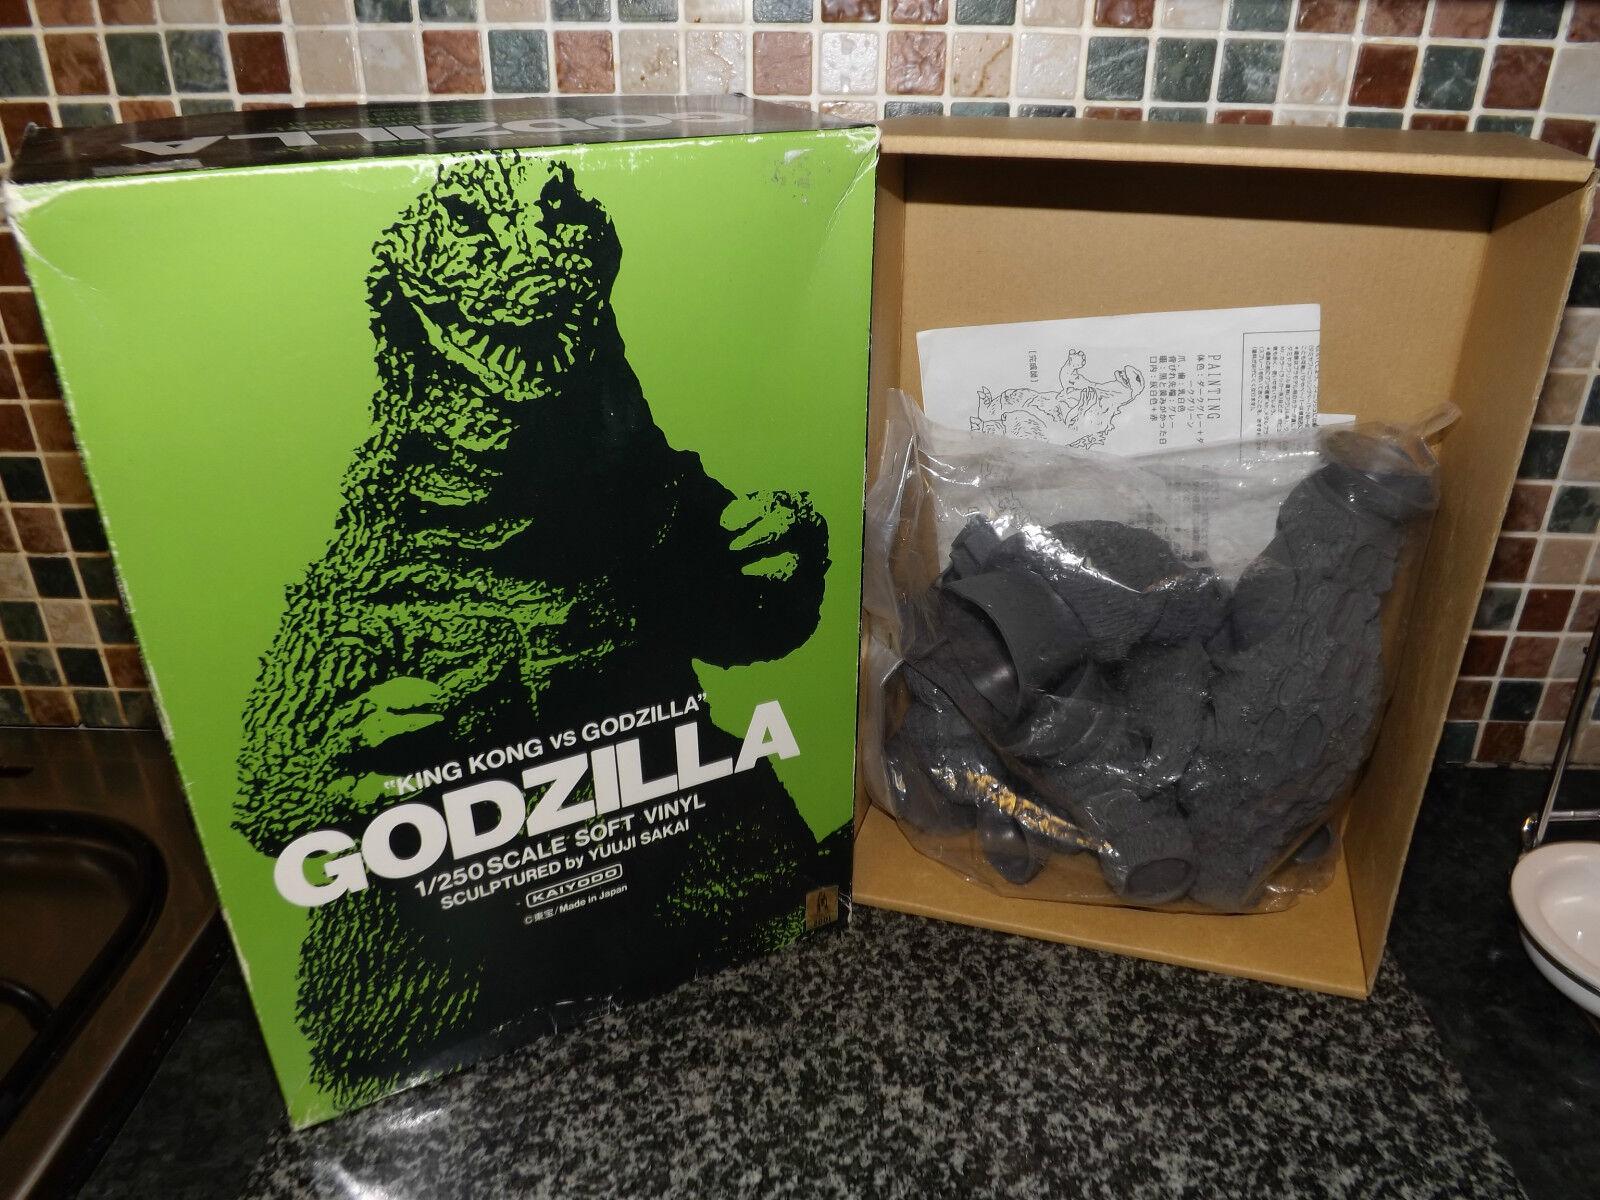 Kaiyodo japan king kong vs Godzilla unused 1962 sealed  SOFT VINYL CONSTRUCTION